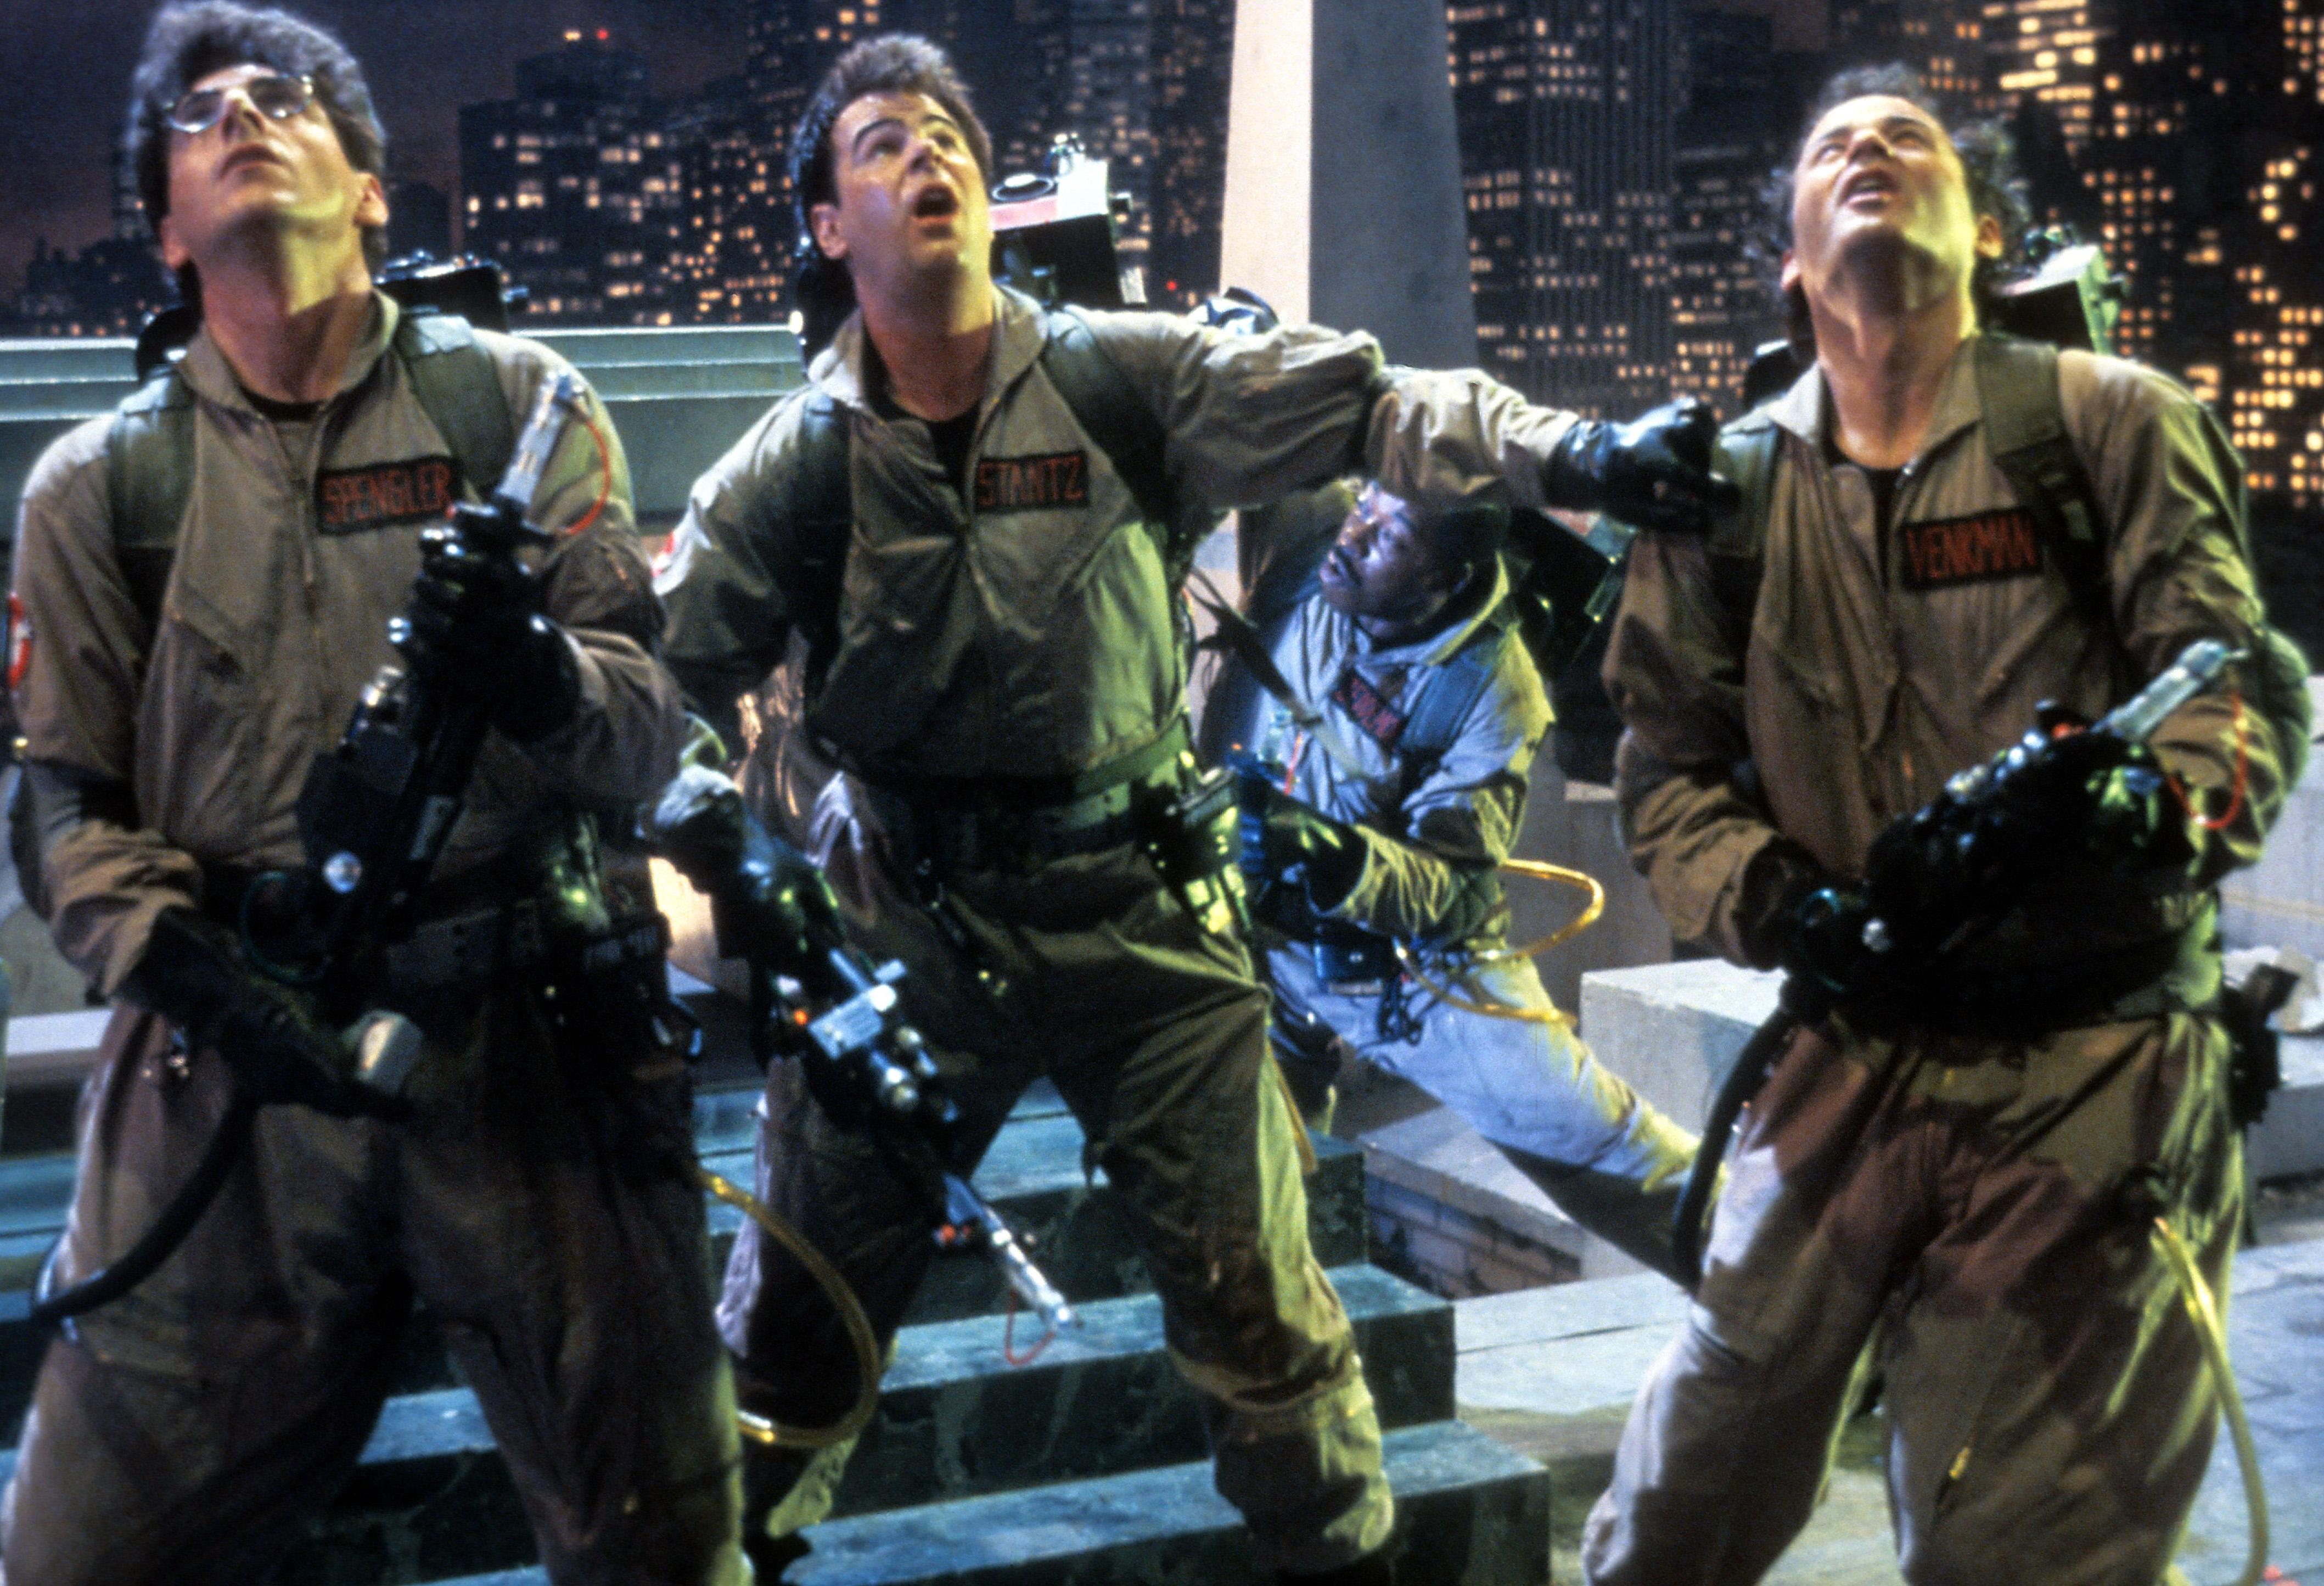 Harold Ramis, Dan Aykroyd, and Bill Murray in a scene from the film 'Ghostbusters', 1984.